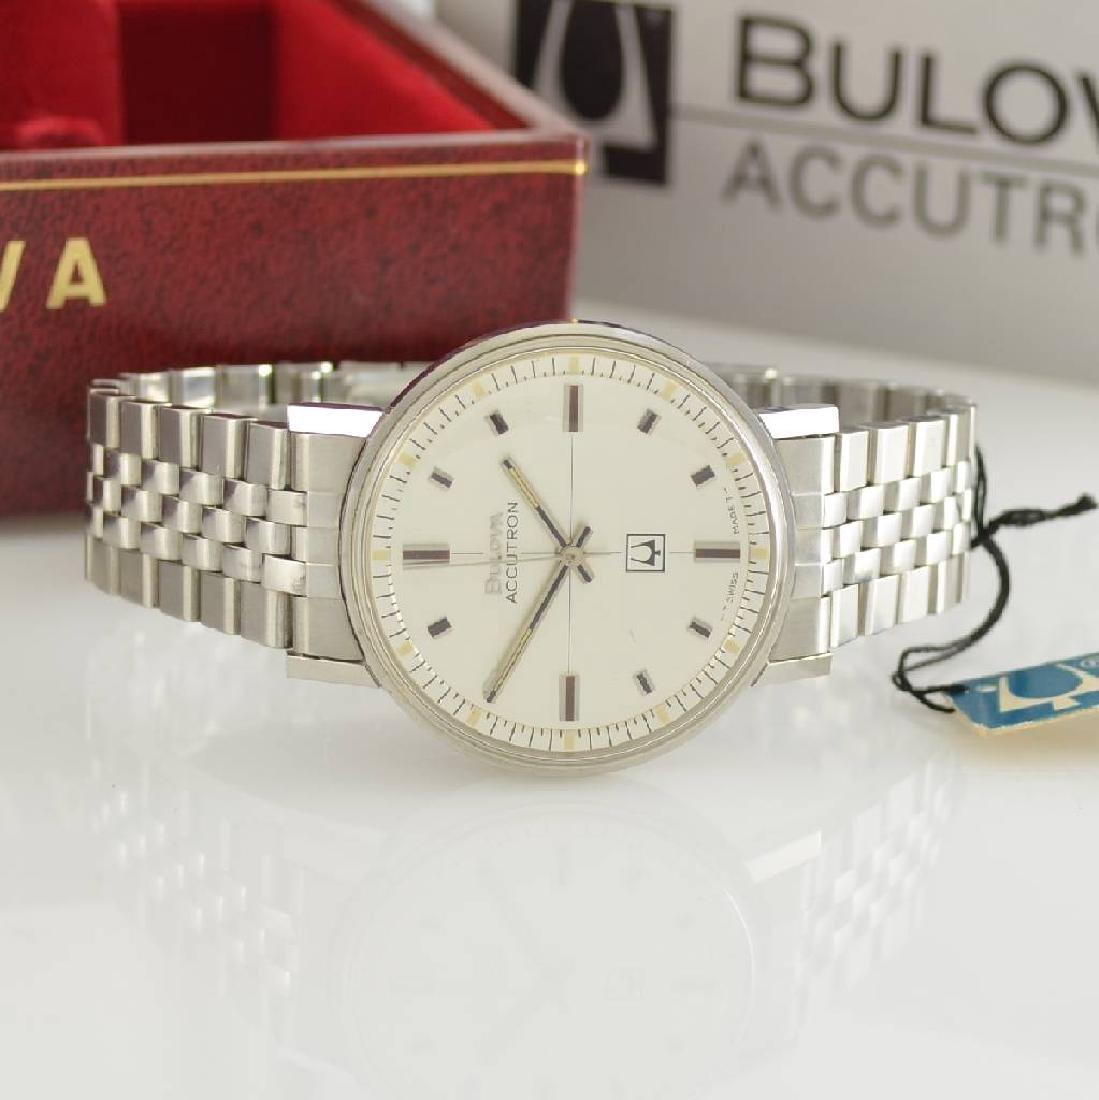 BULOVA Accutron unworn gents wristwatch in steel - 2